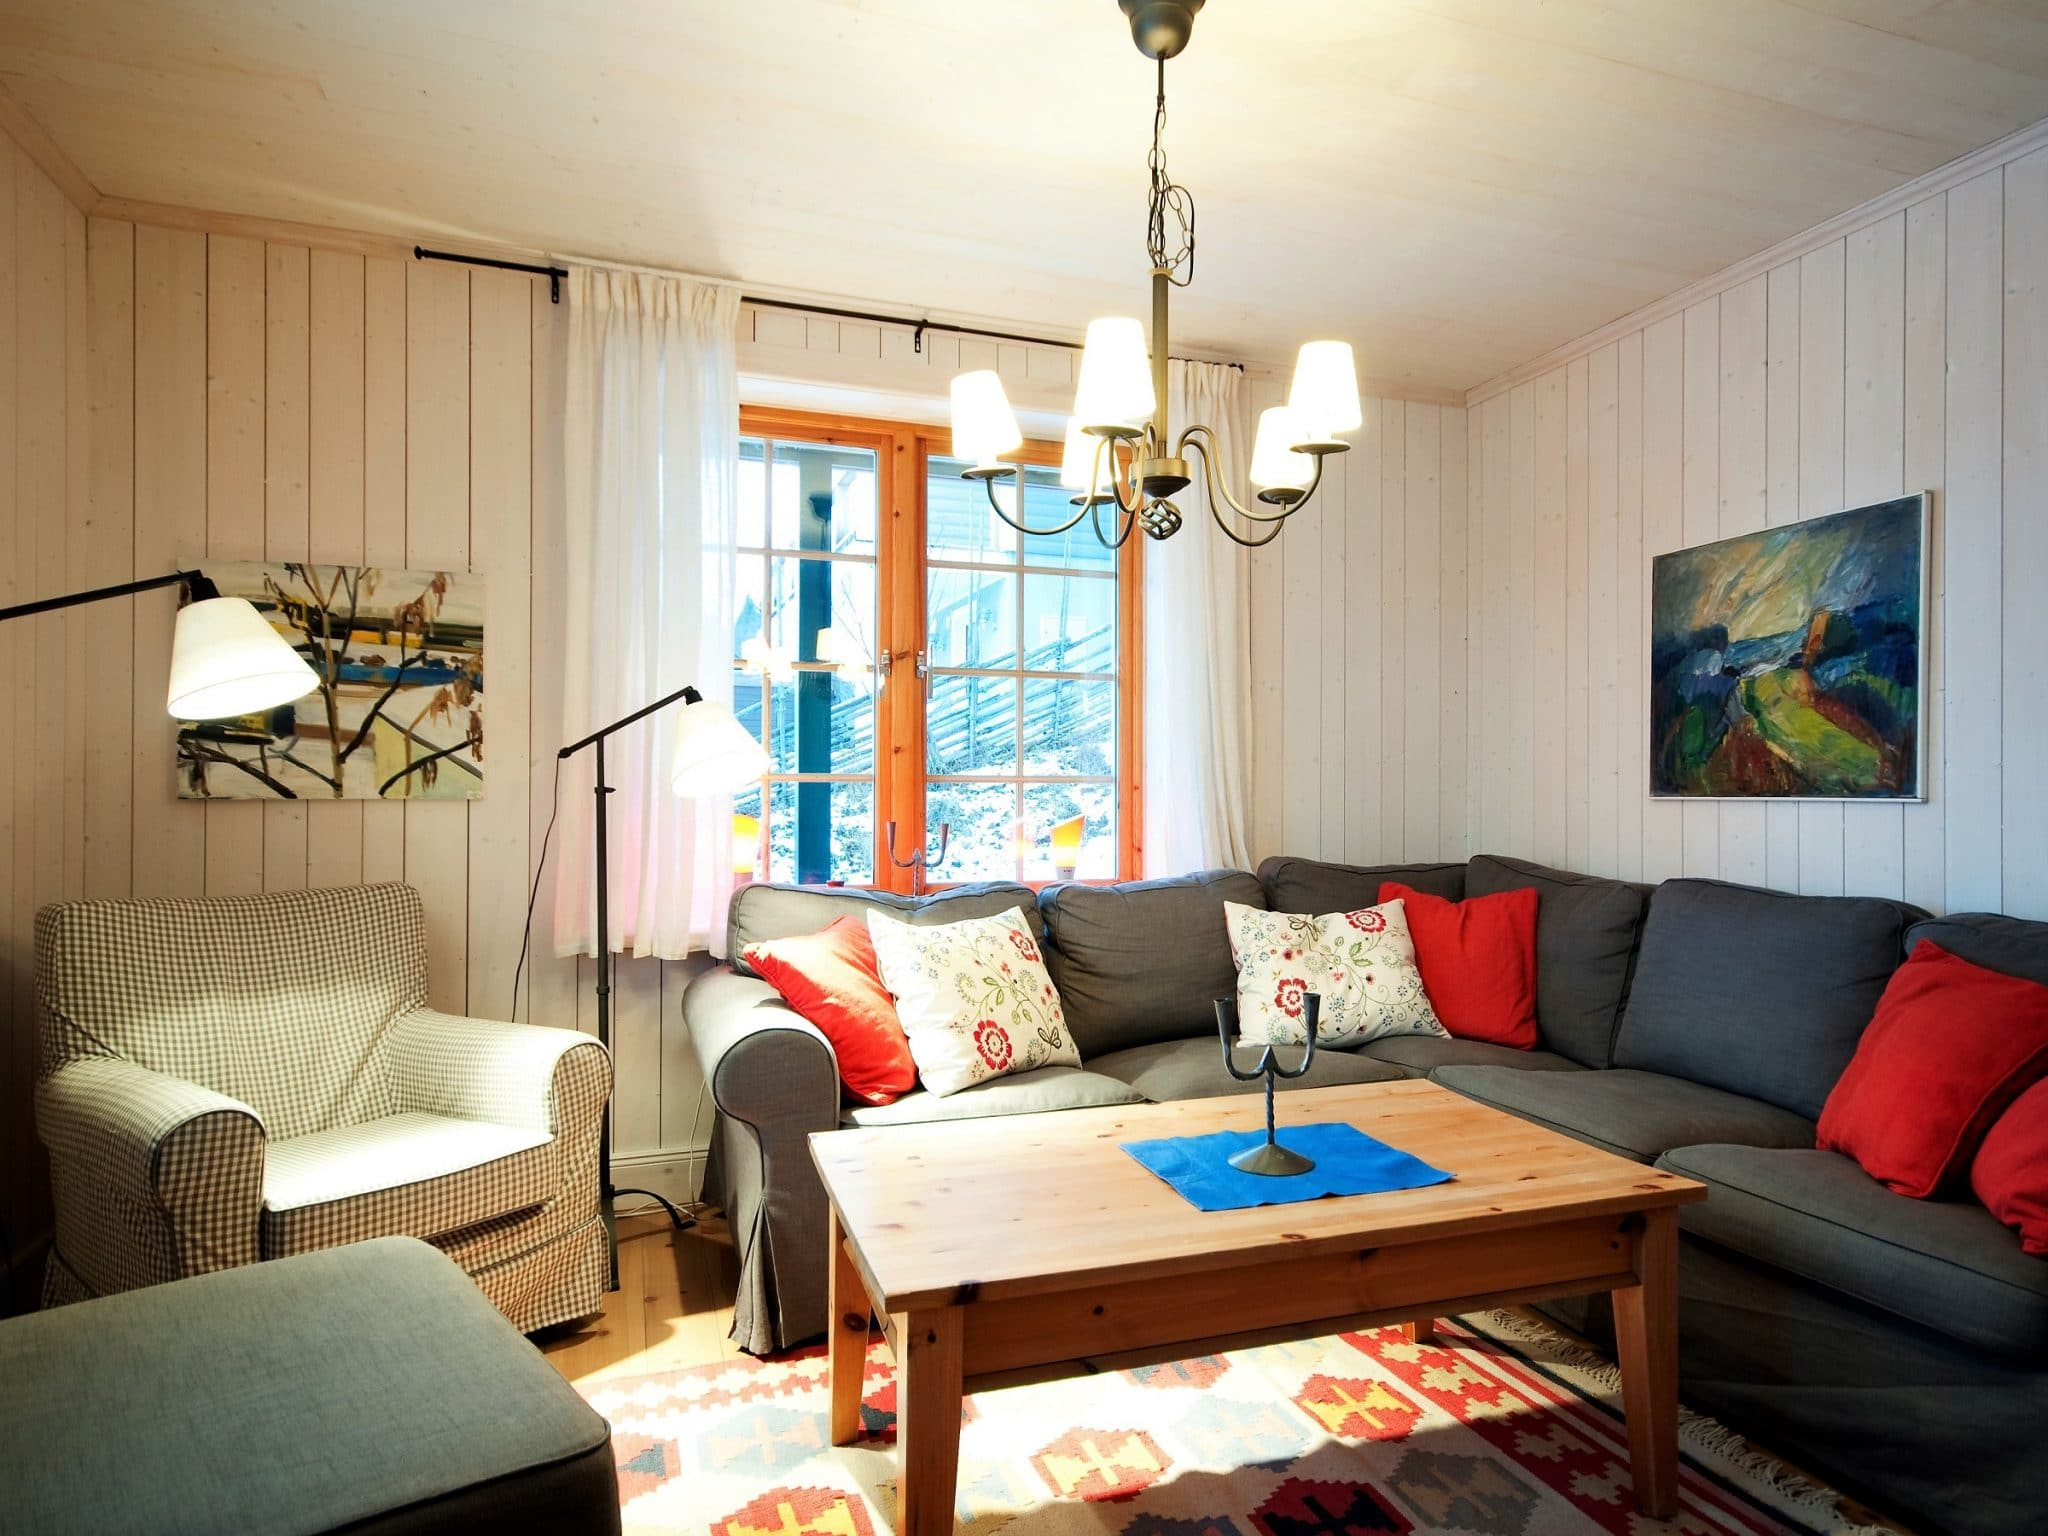 Vardagsrum med öppen spis i Slalomsvängen 27 i Åre